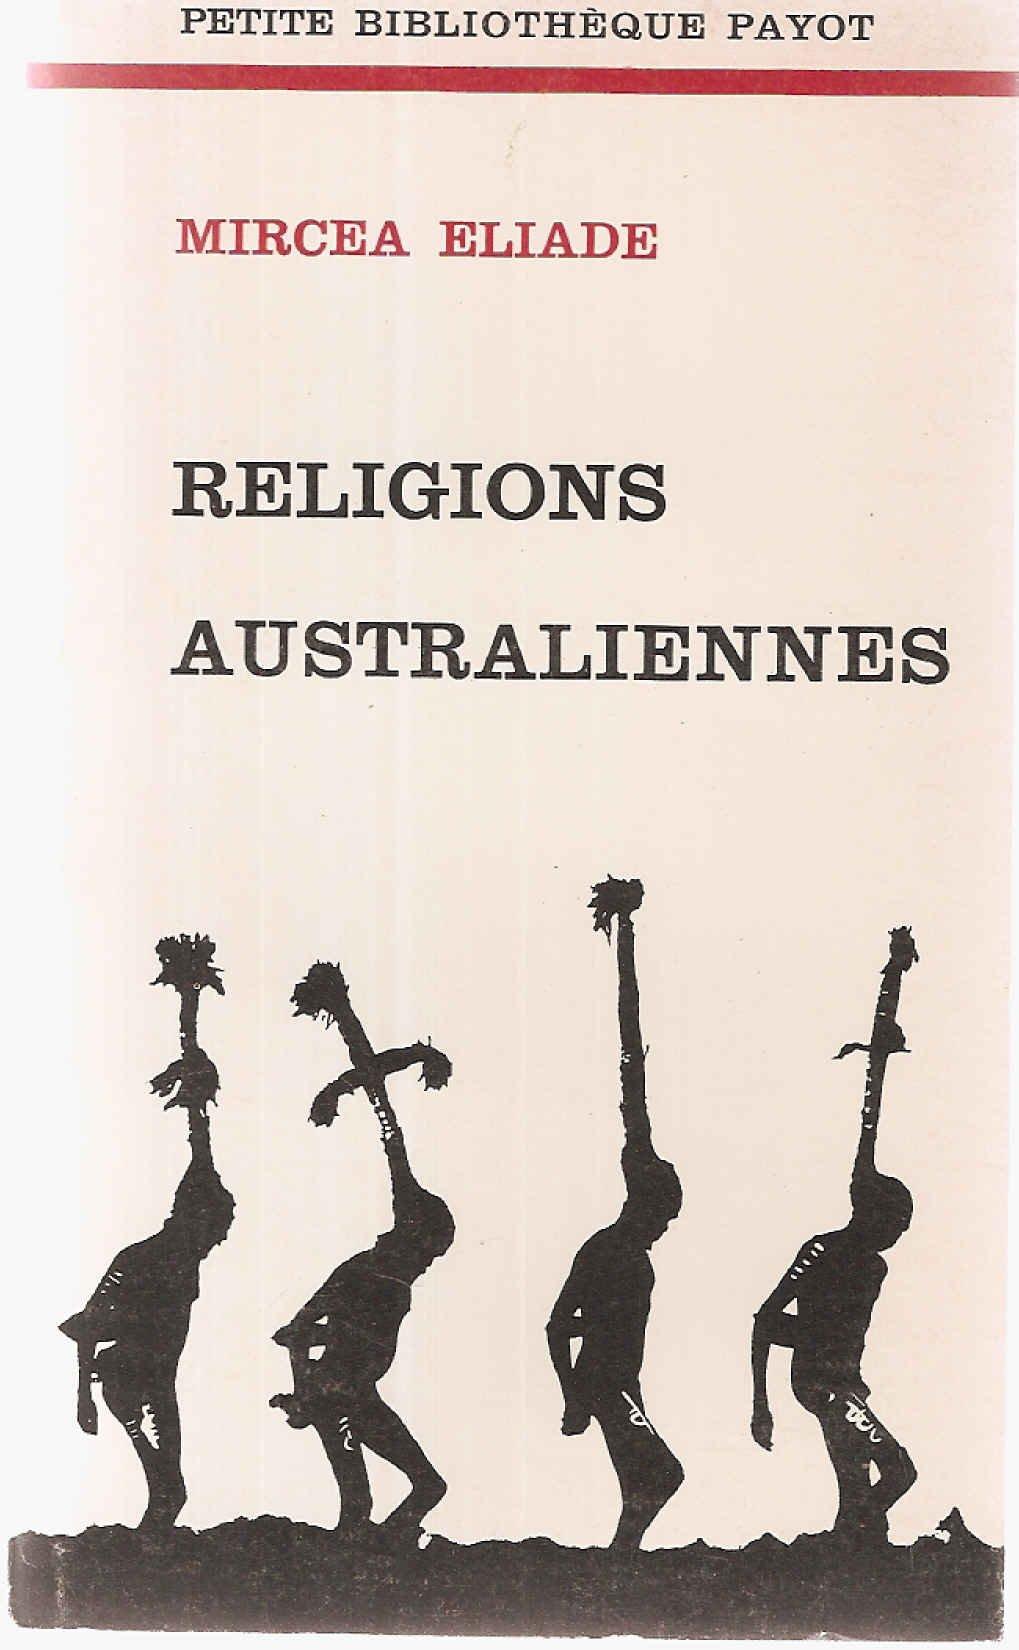 Religions australiennes: Mircea Eliade: Amazon.com: Books